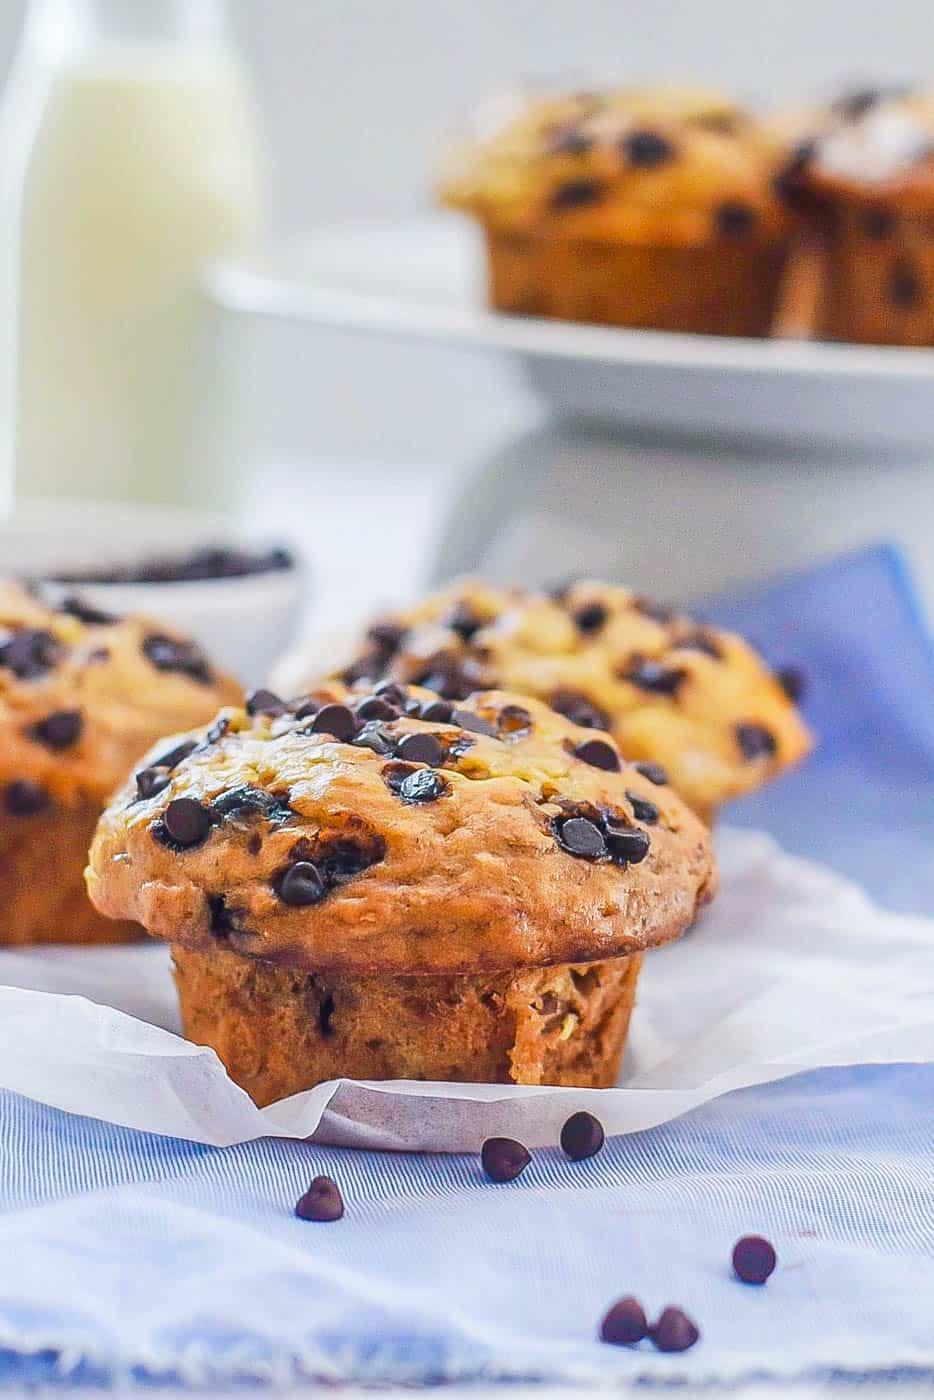 Chocolate Chip Banana Muffins Recipe (Easy + Healthy!)